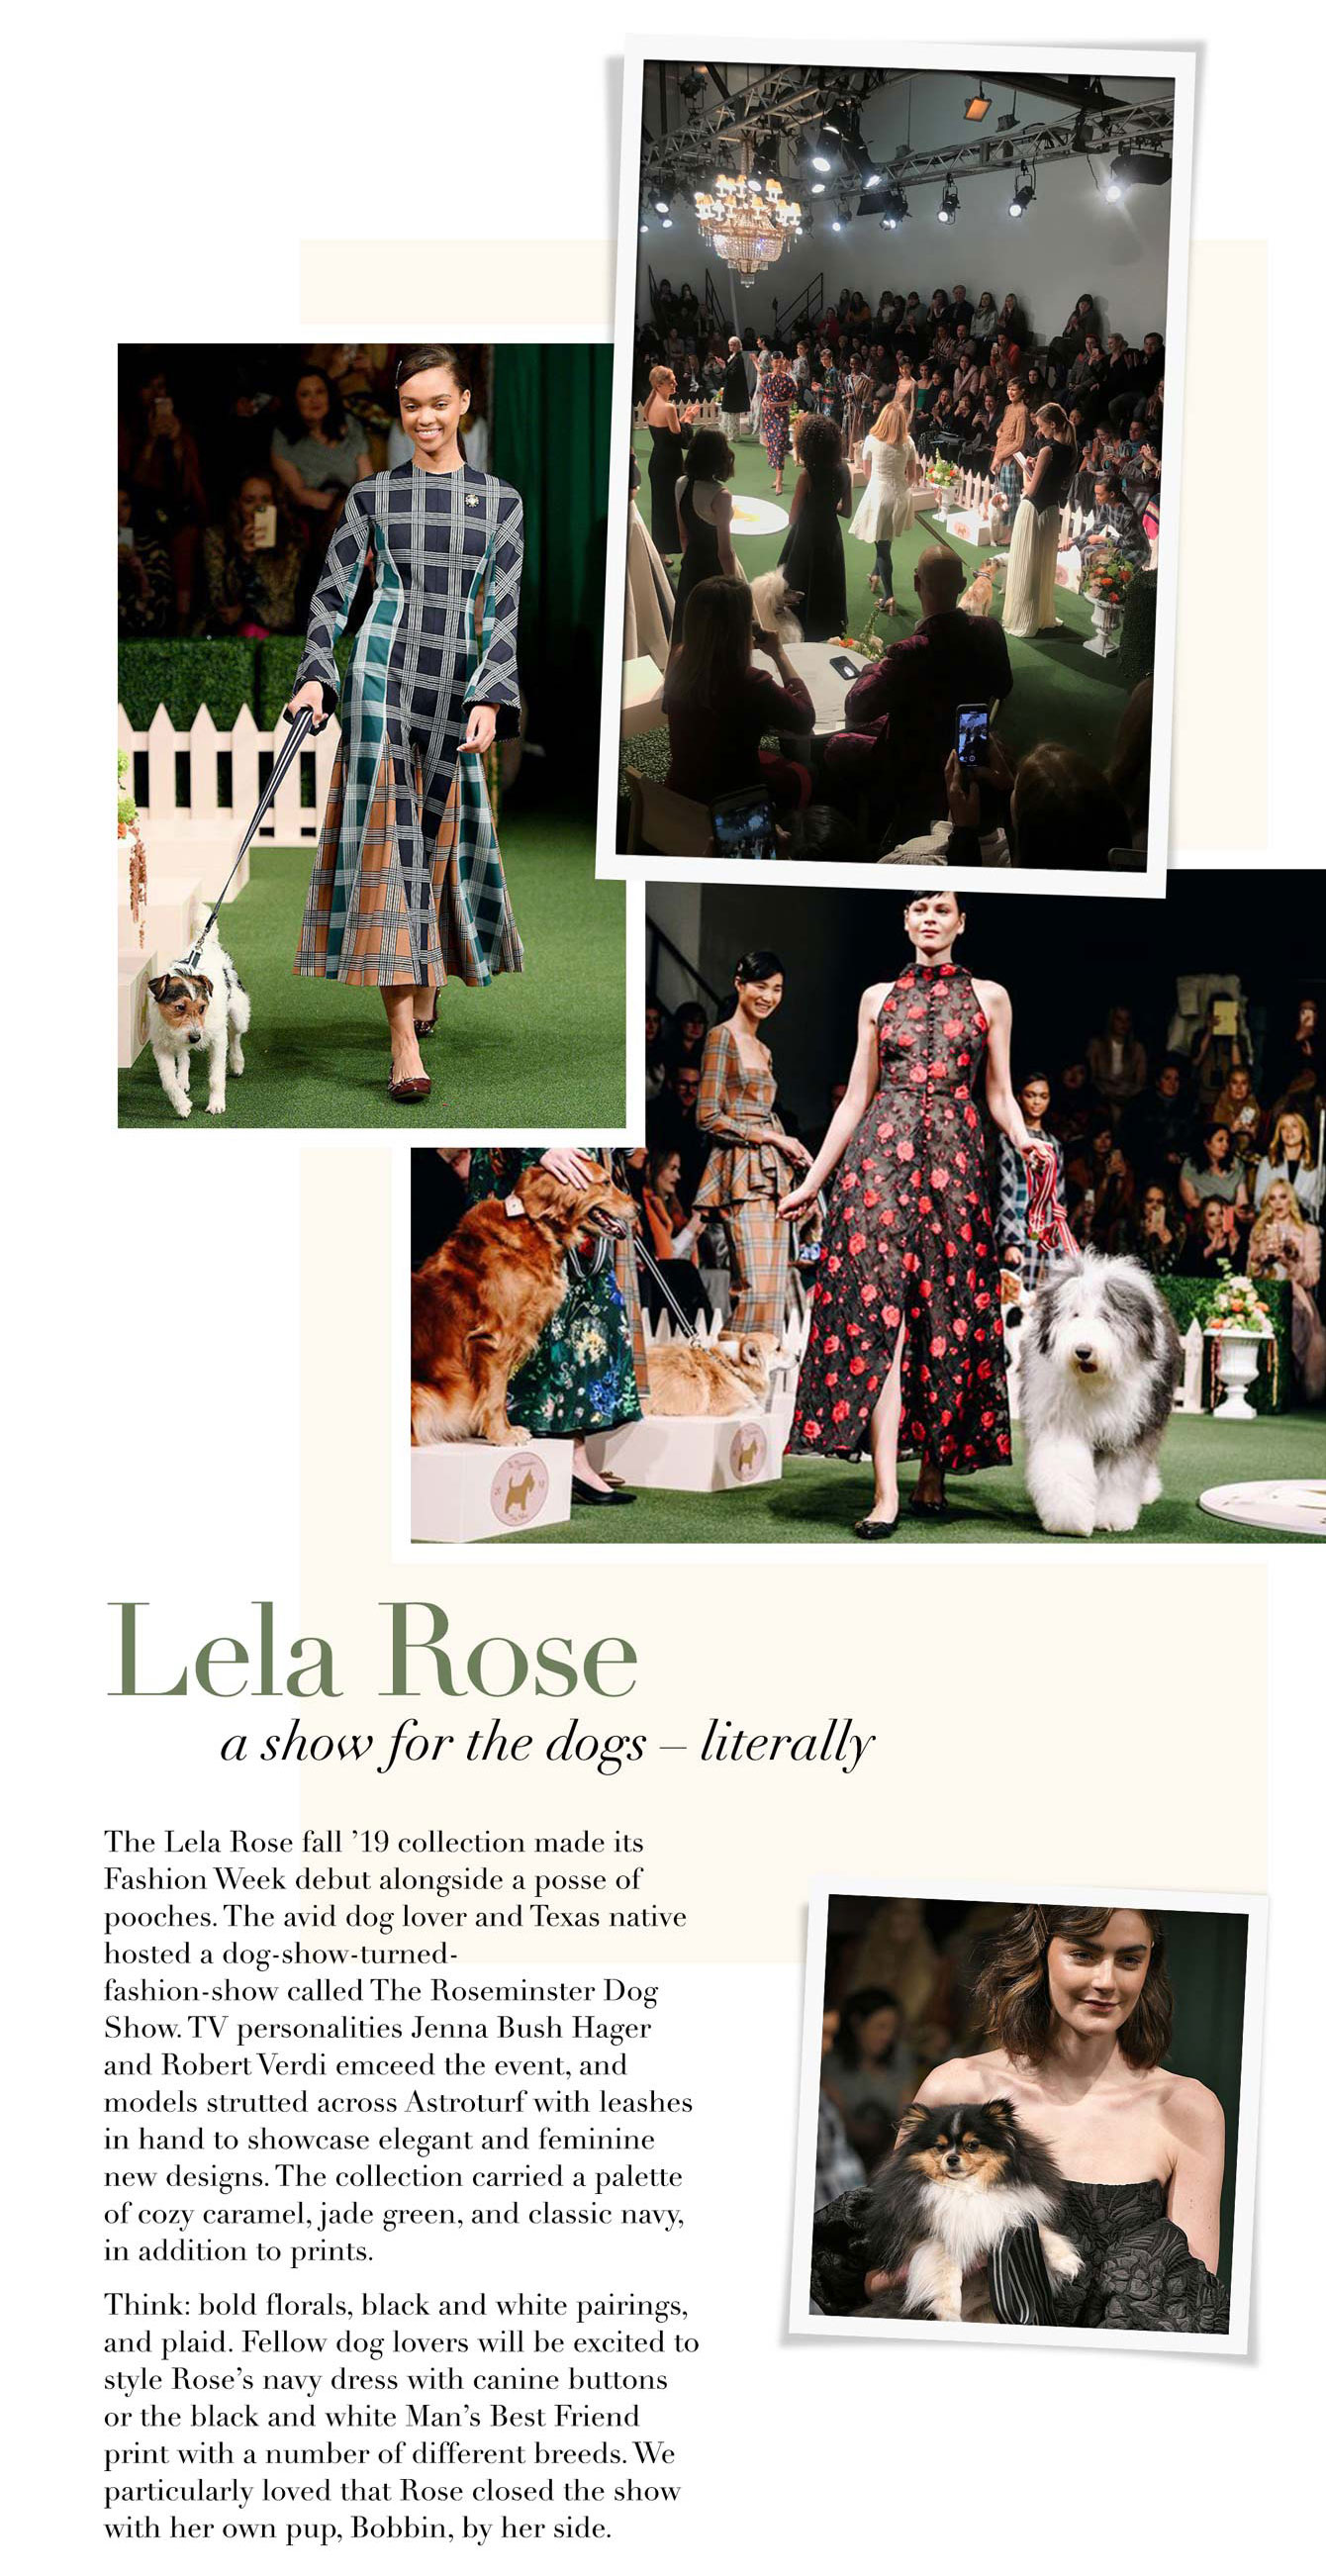 Lela Rose